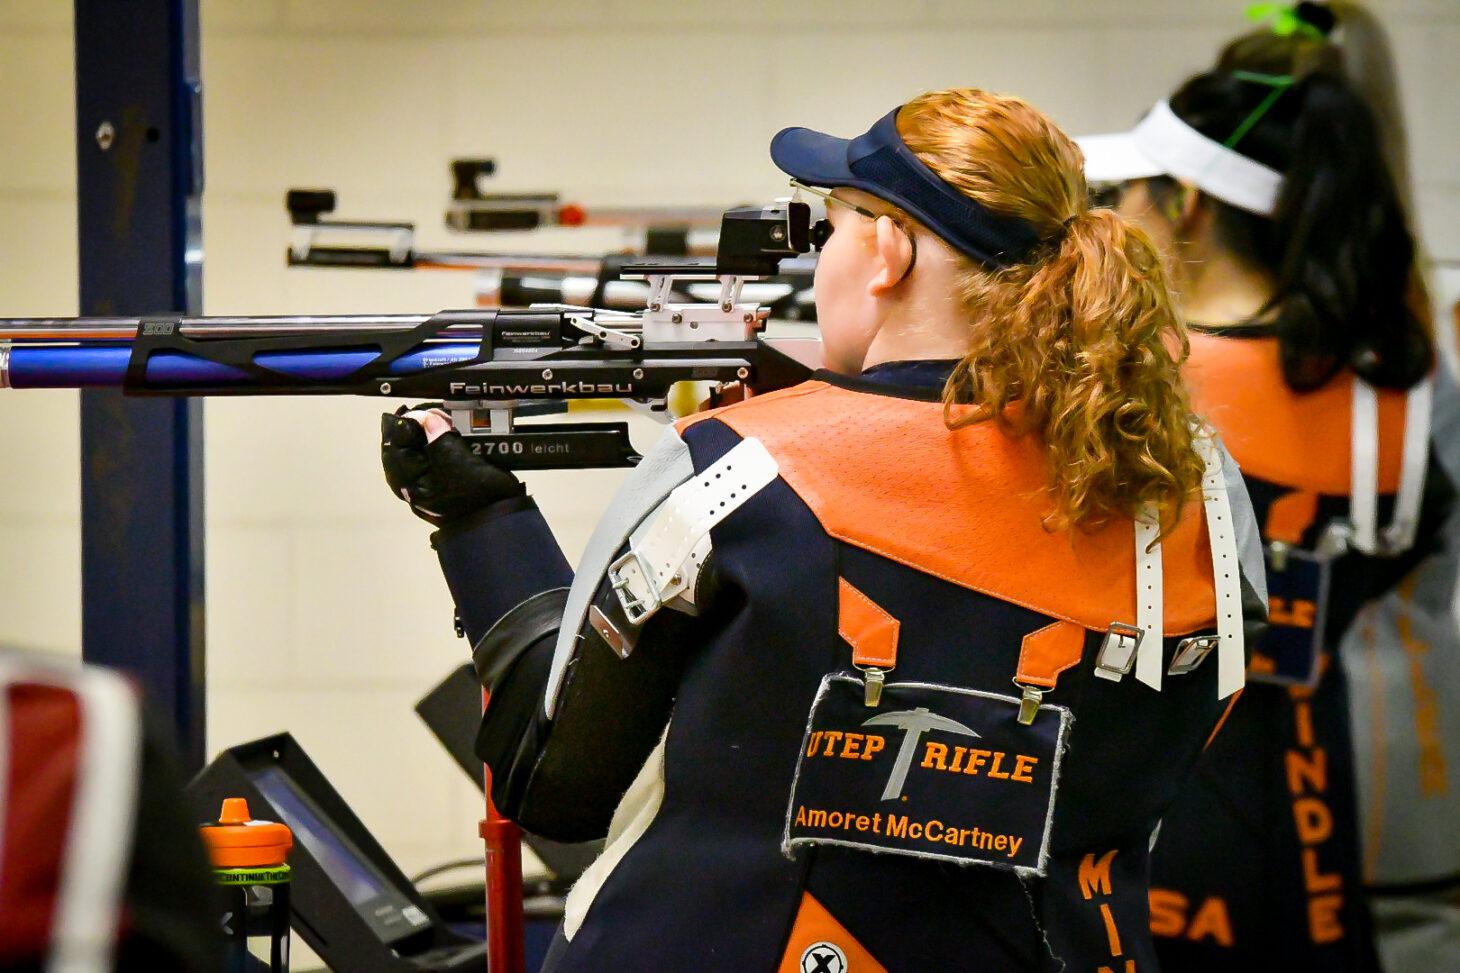 UTEP Rifle vs Nebraska Rifle Oct 9, 2021 El Paso,  |  Photo by Andres Acosta – UTEP